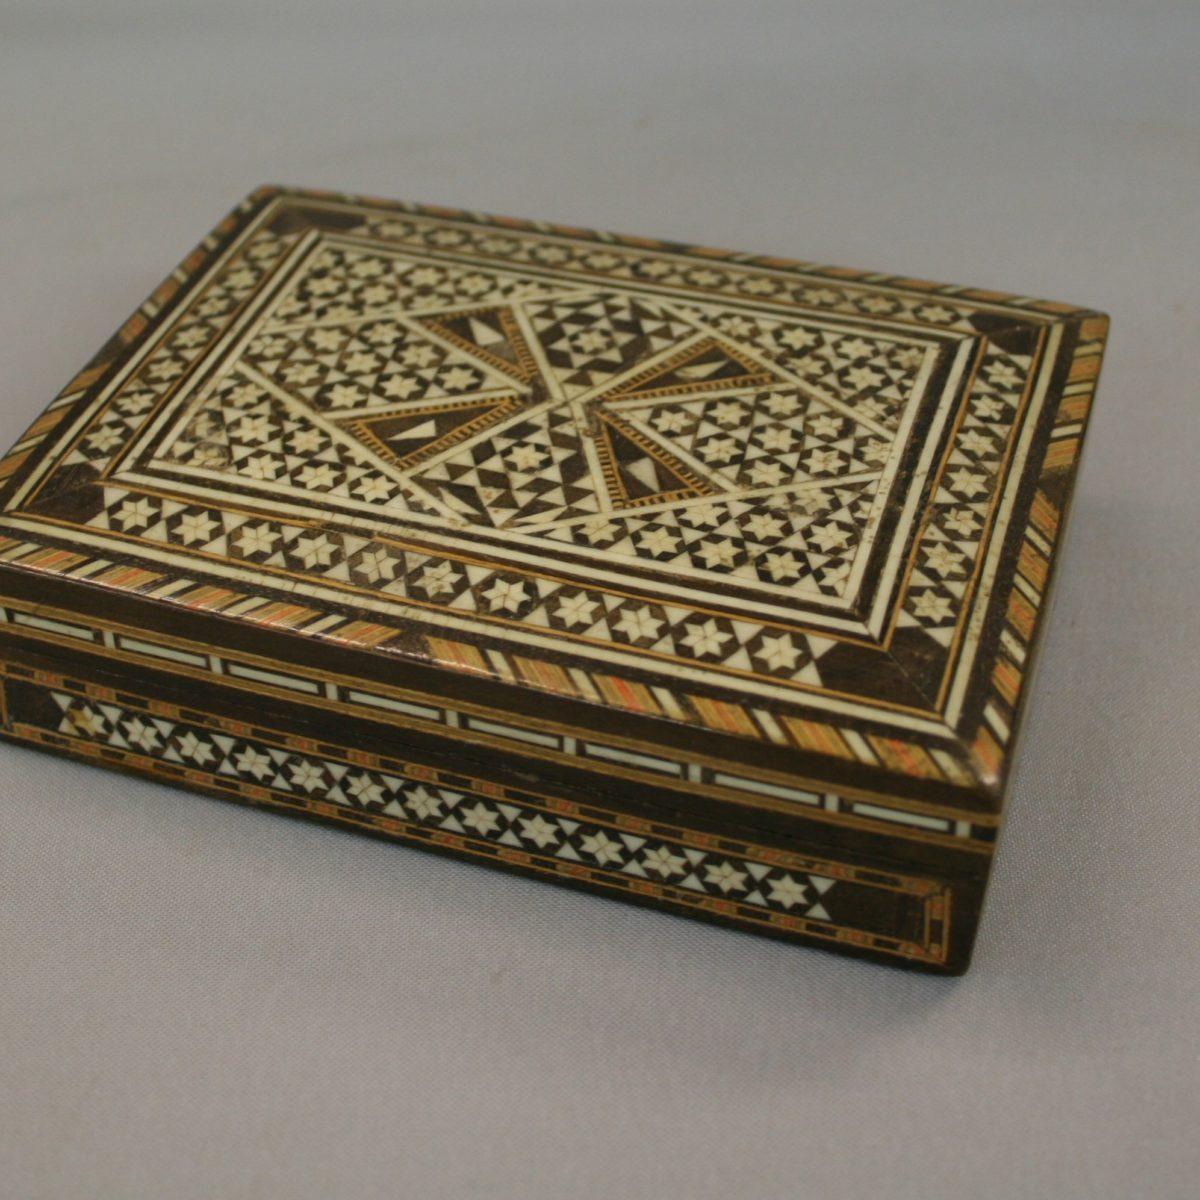 Moroccan style wooden trinket box/williamsantiques